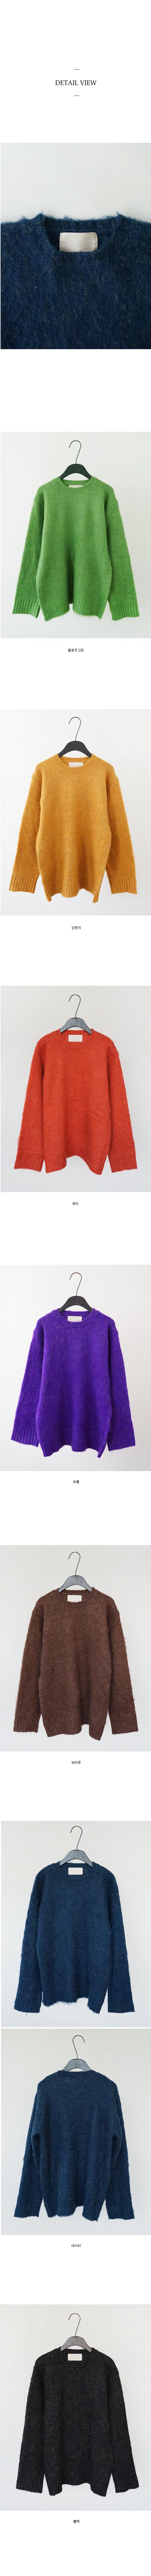 melange loose-fit knit (7colors)